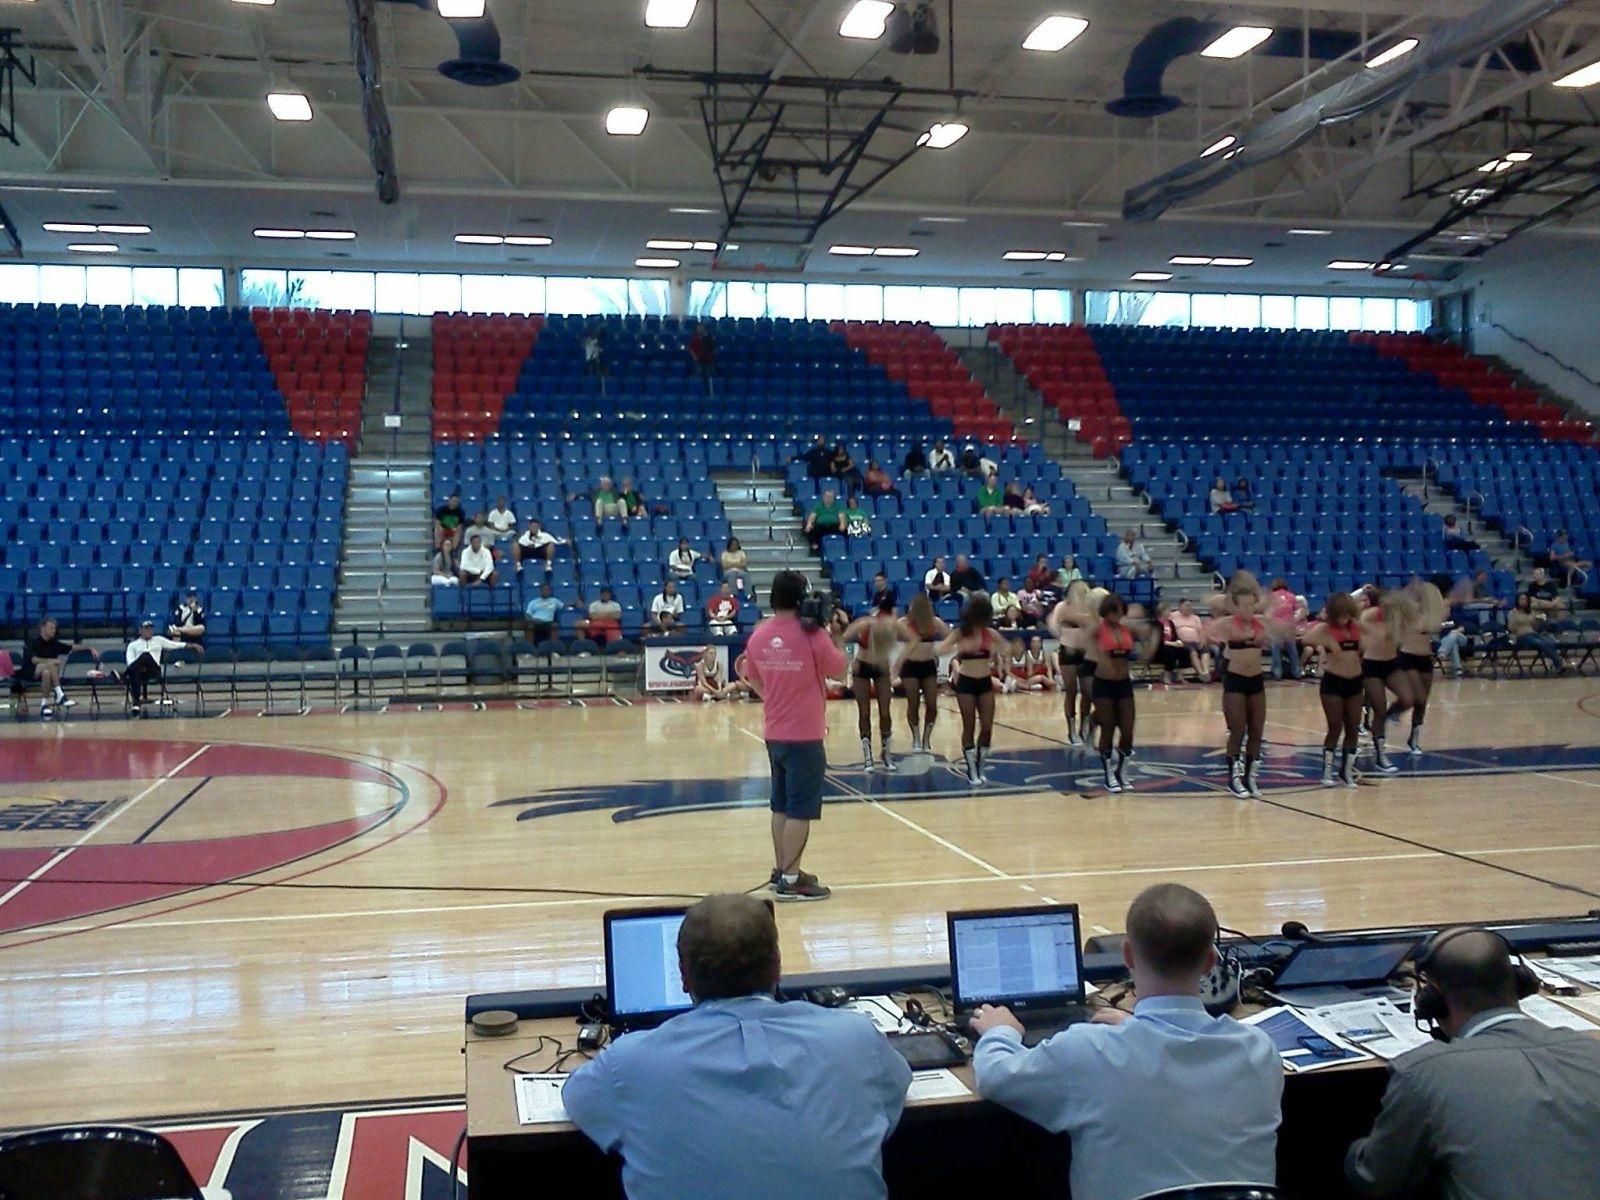 Basketball Arena Fans Fau Arena Basketball Game vs